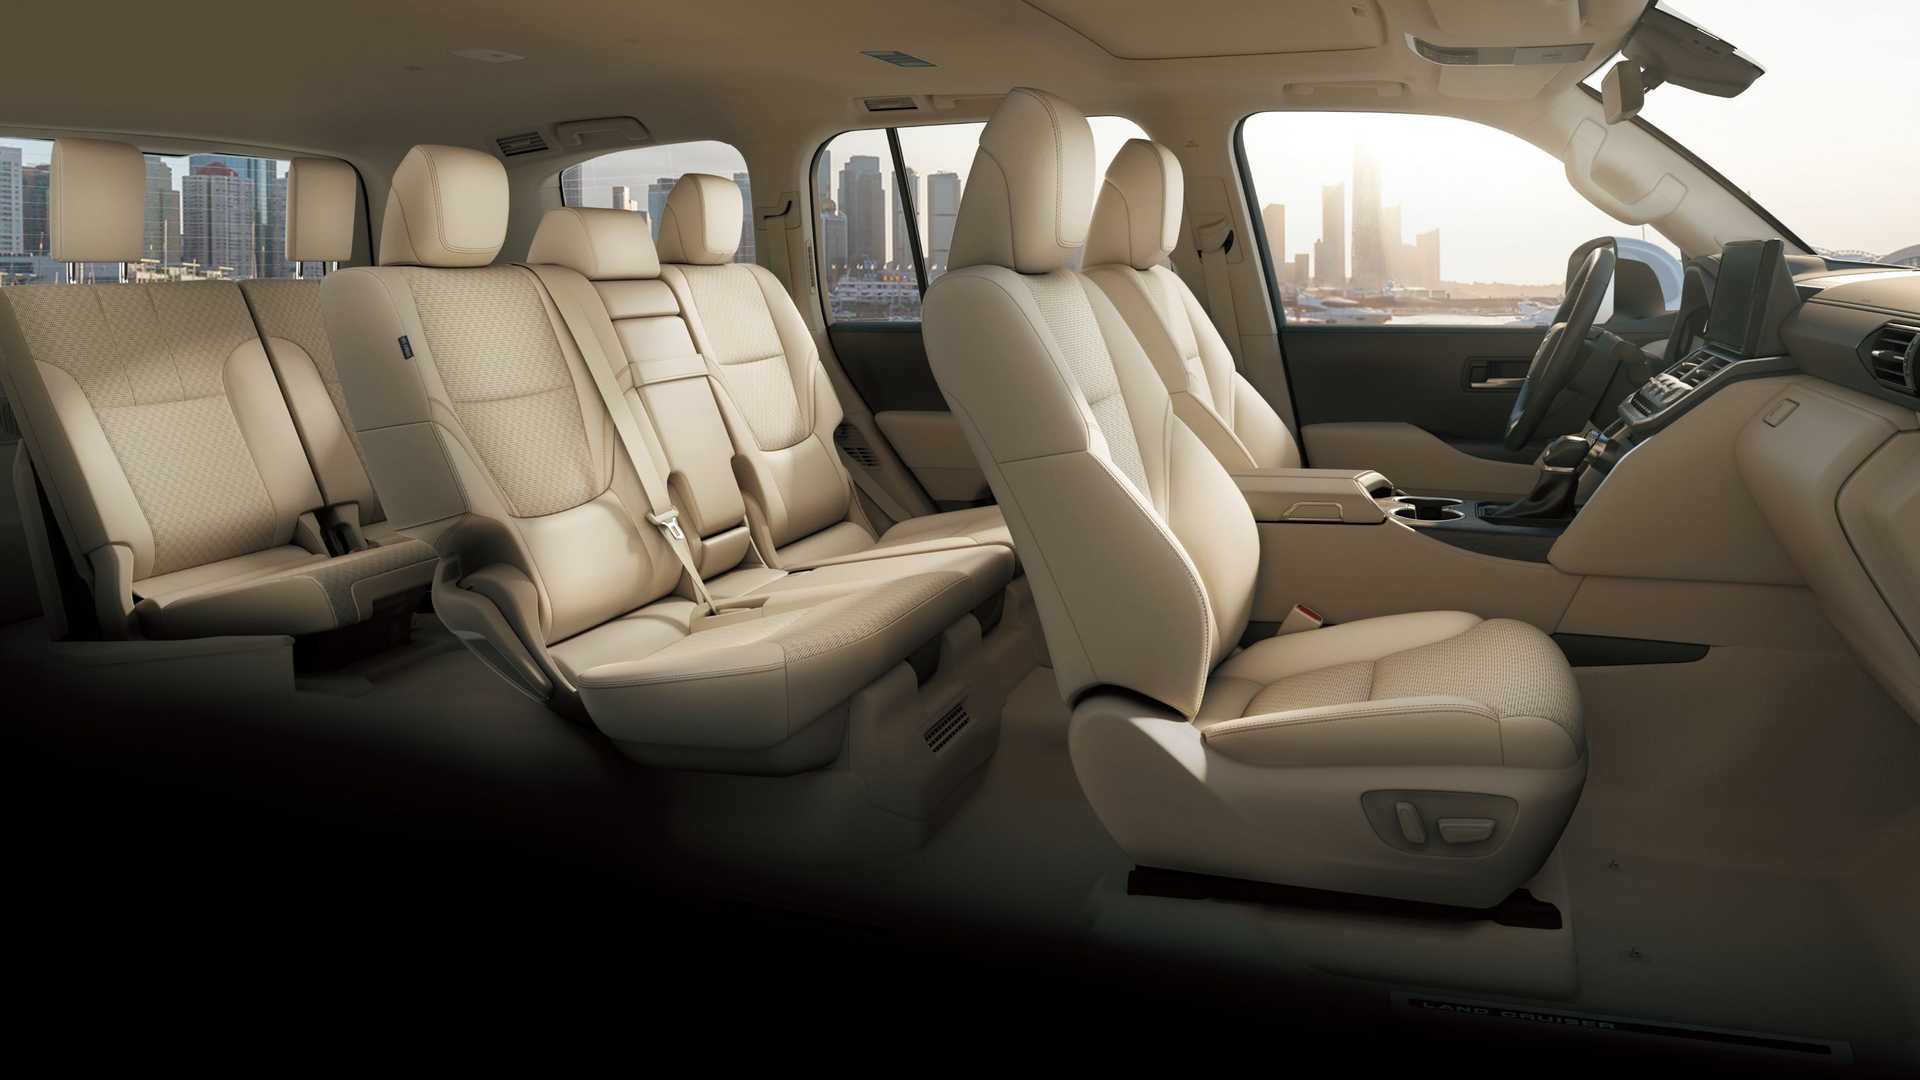 New Toyota Land Cruiser 300 Interior seating